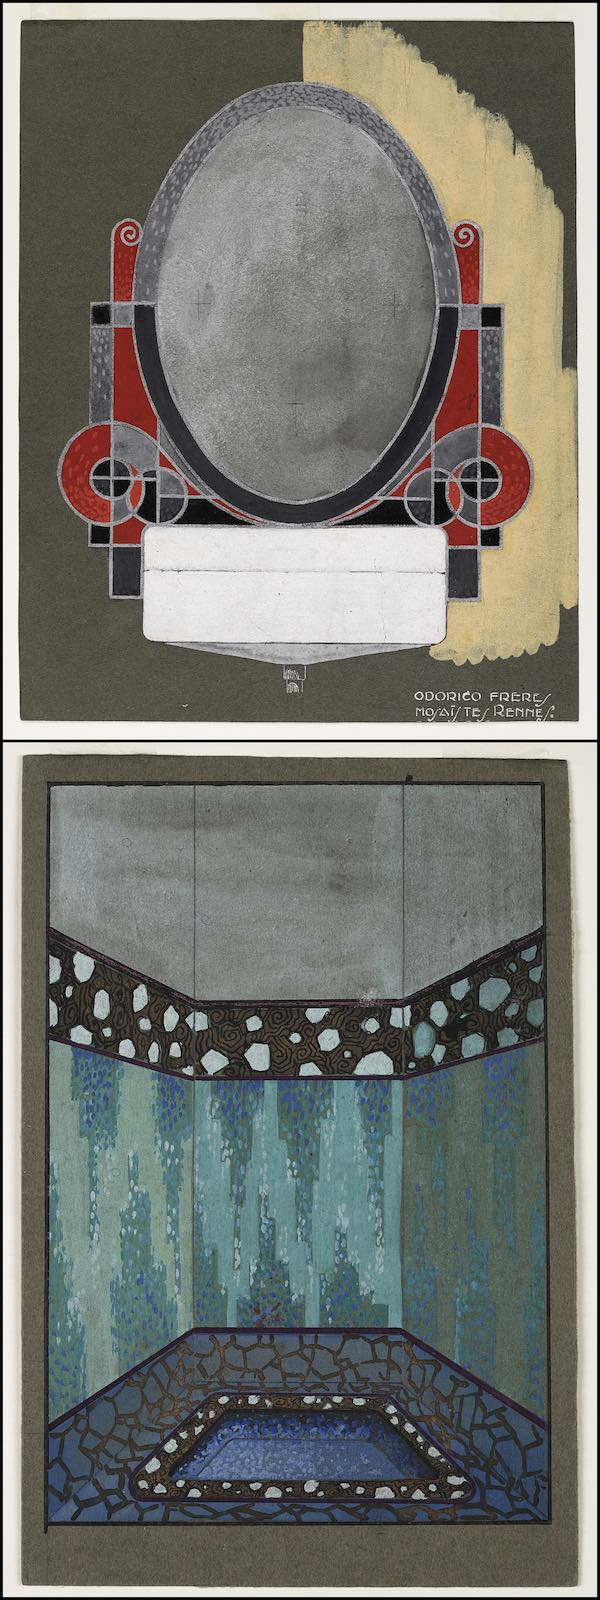 dessins de motifs de mosaïques Odorico